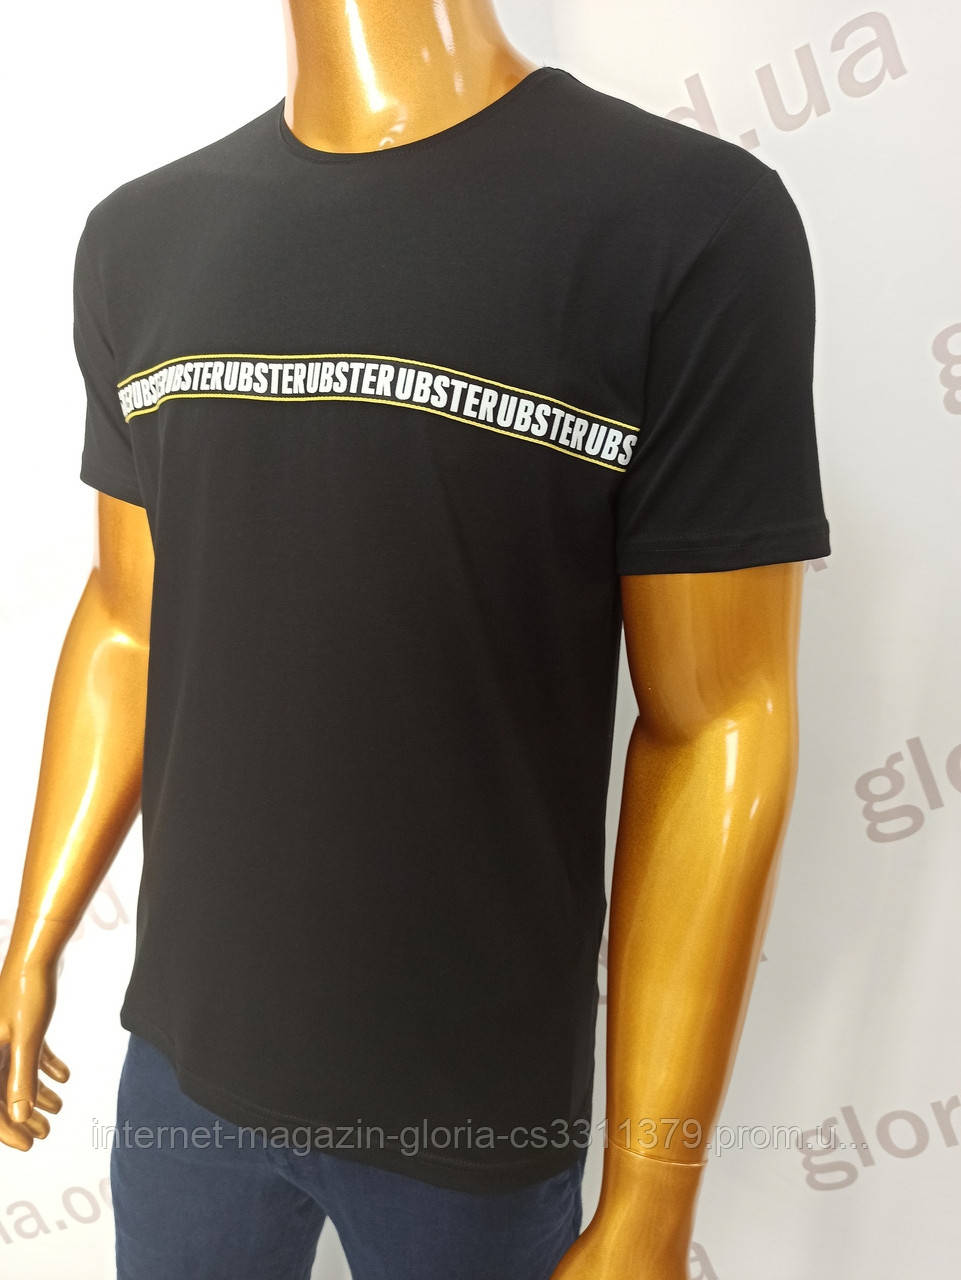 Мужская футболка MSY. 42668-8343(ч). Размеры: M,L,XL,XXL.